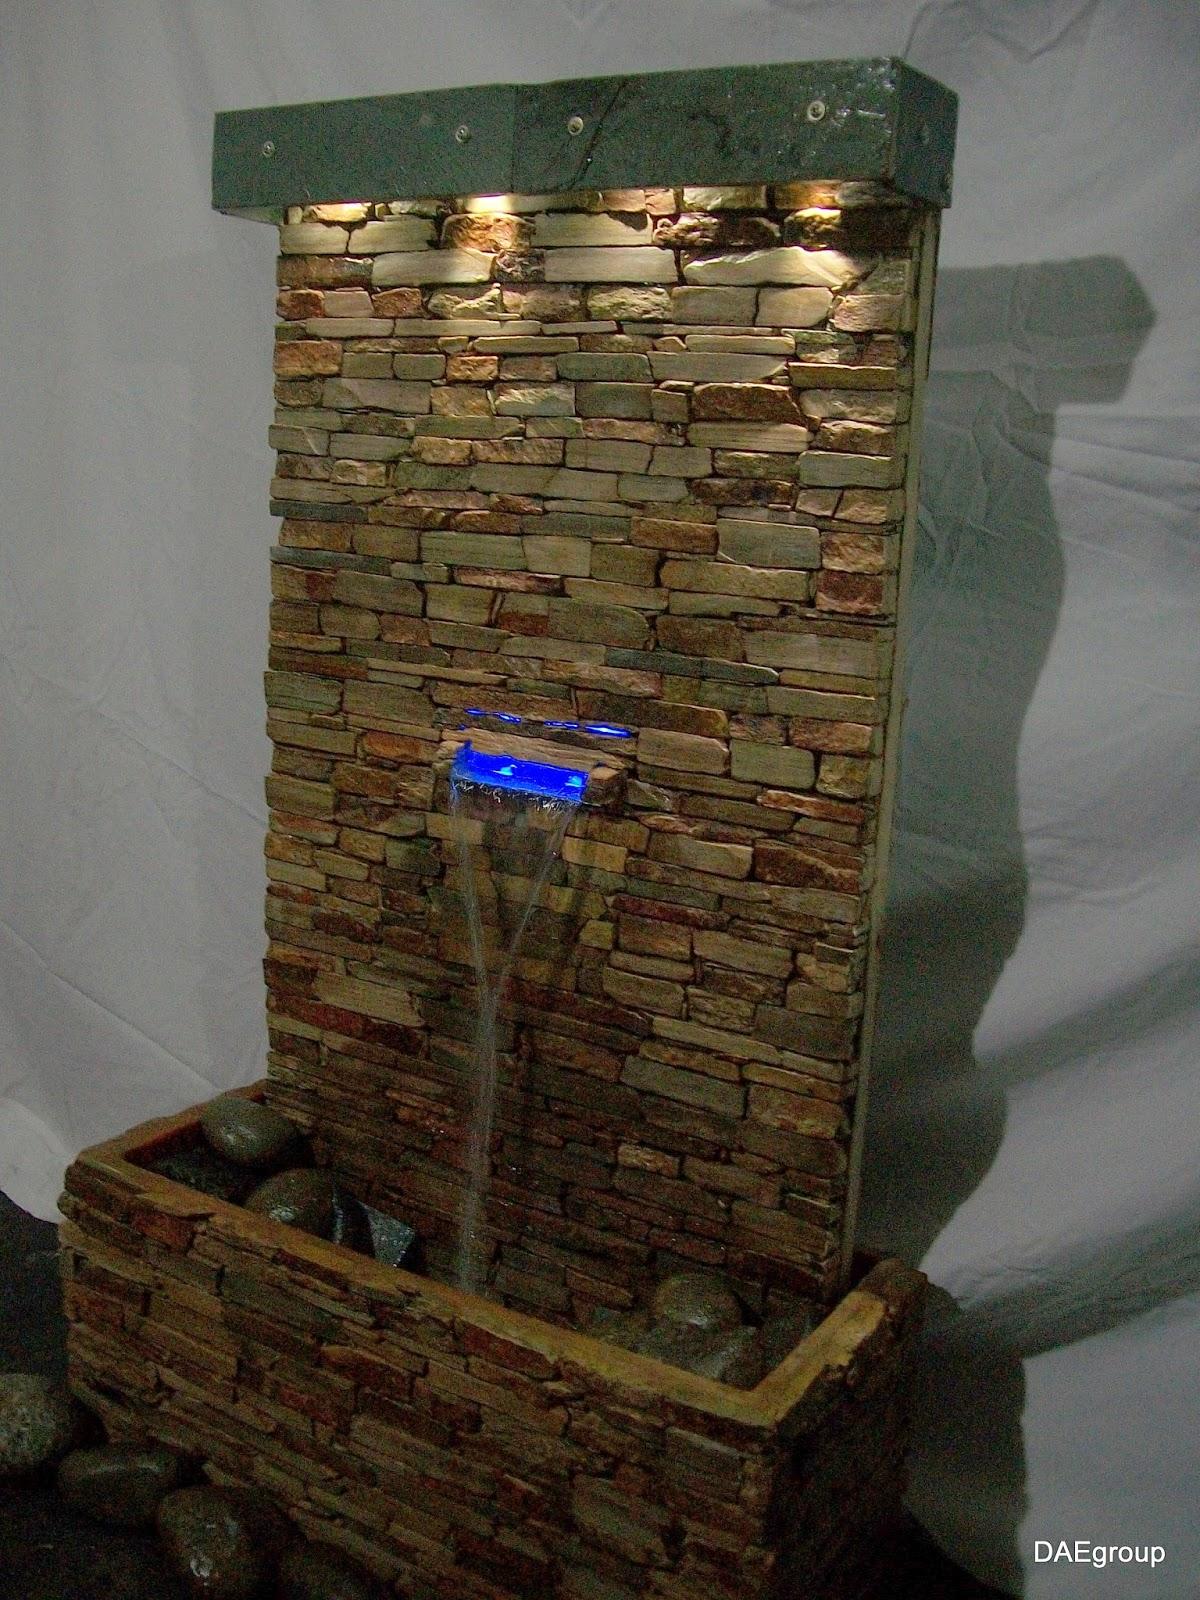 Daegroup paredes de agua cortinas de agua cascadas muros de agua fuentes de agua natatorios - Fuentes de pared ...